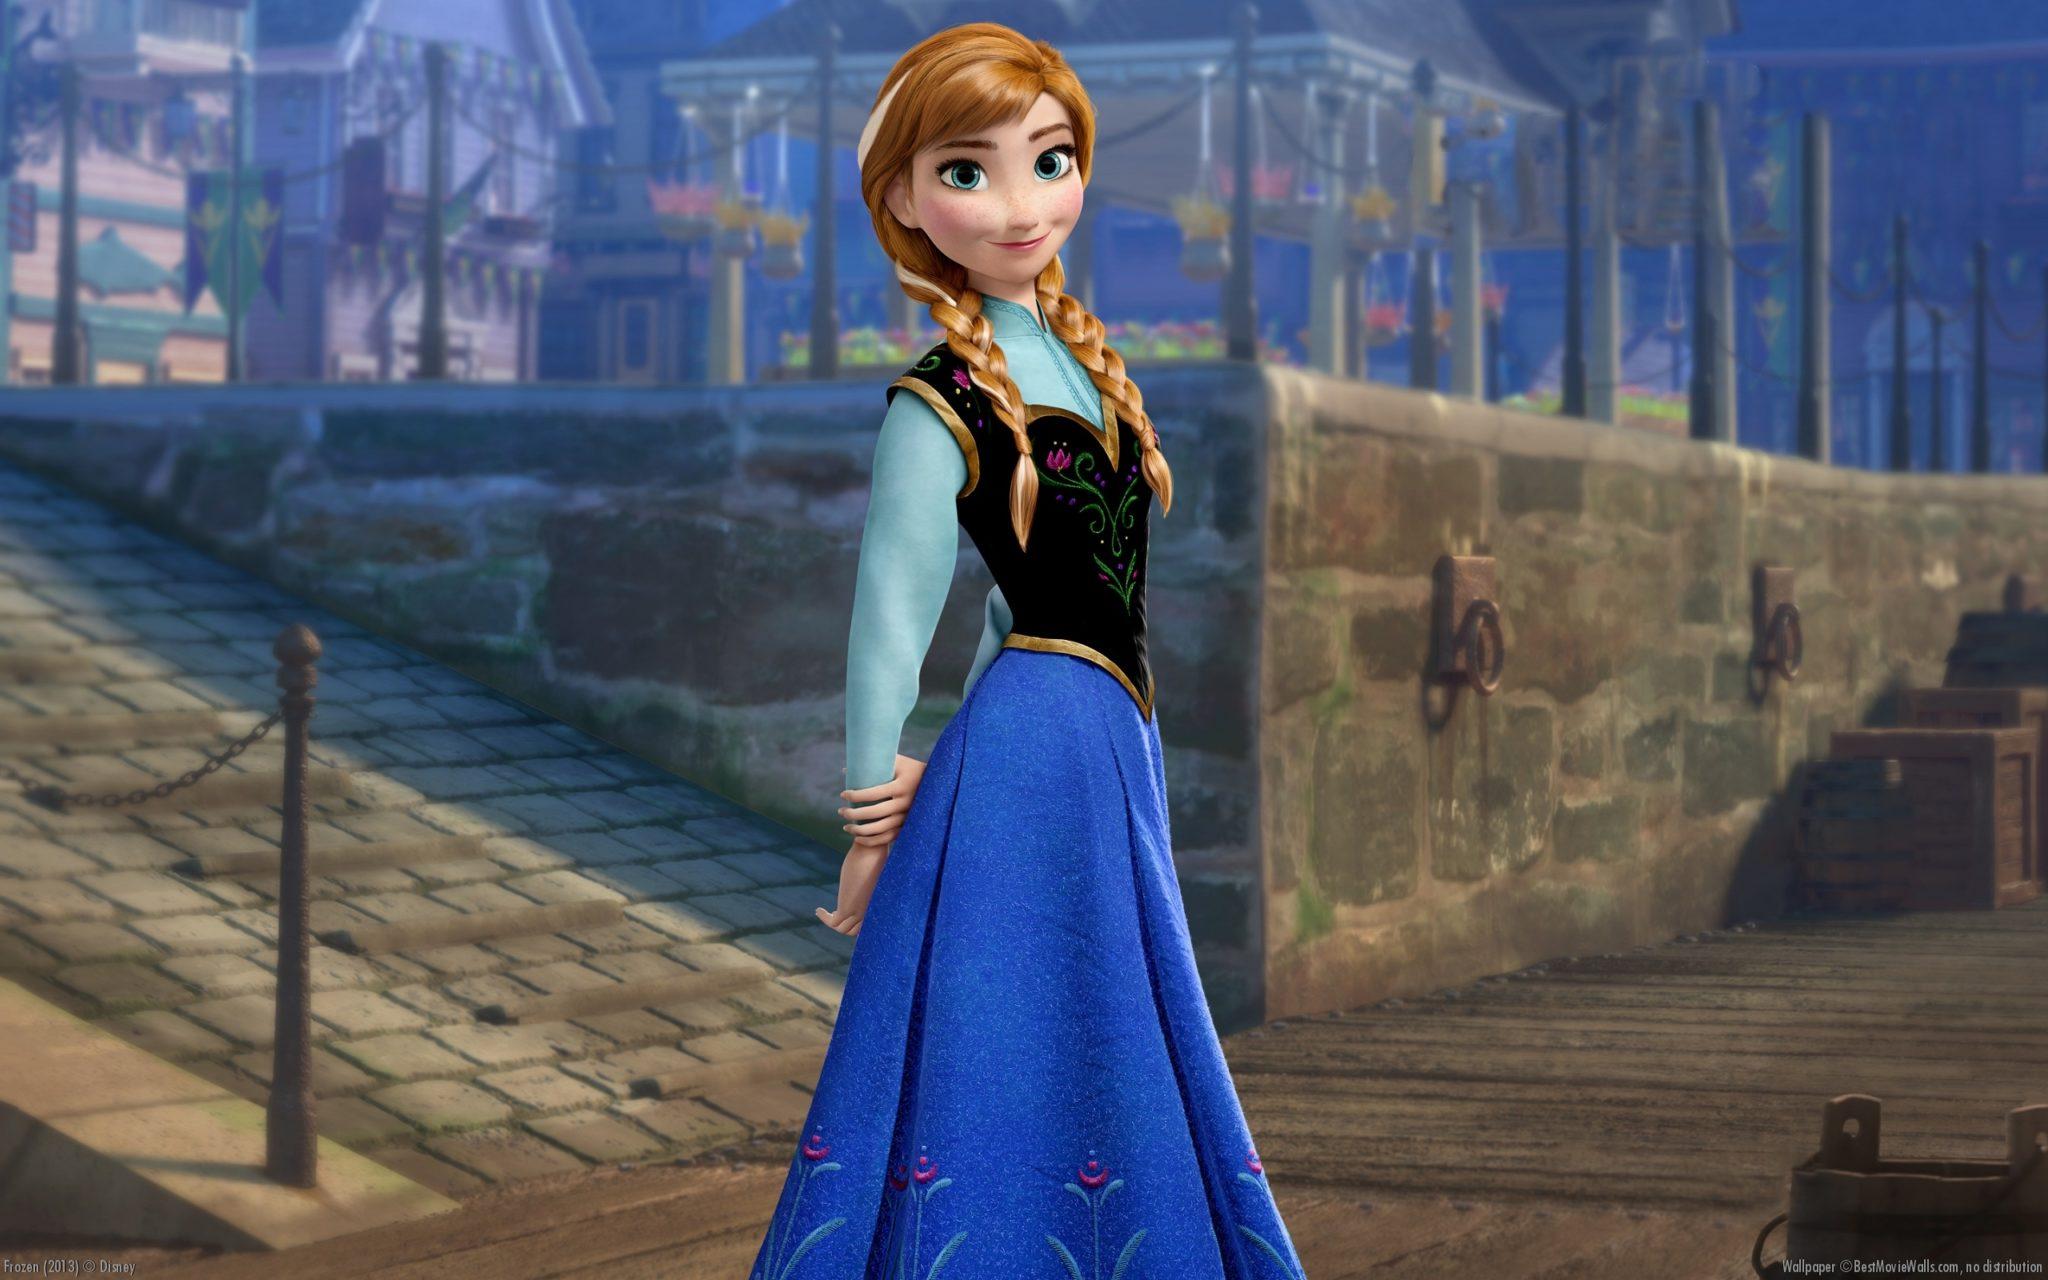 anna wallpaper,blue,clothing,fashion,beauty,dress